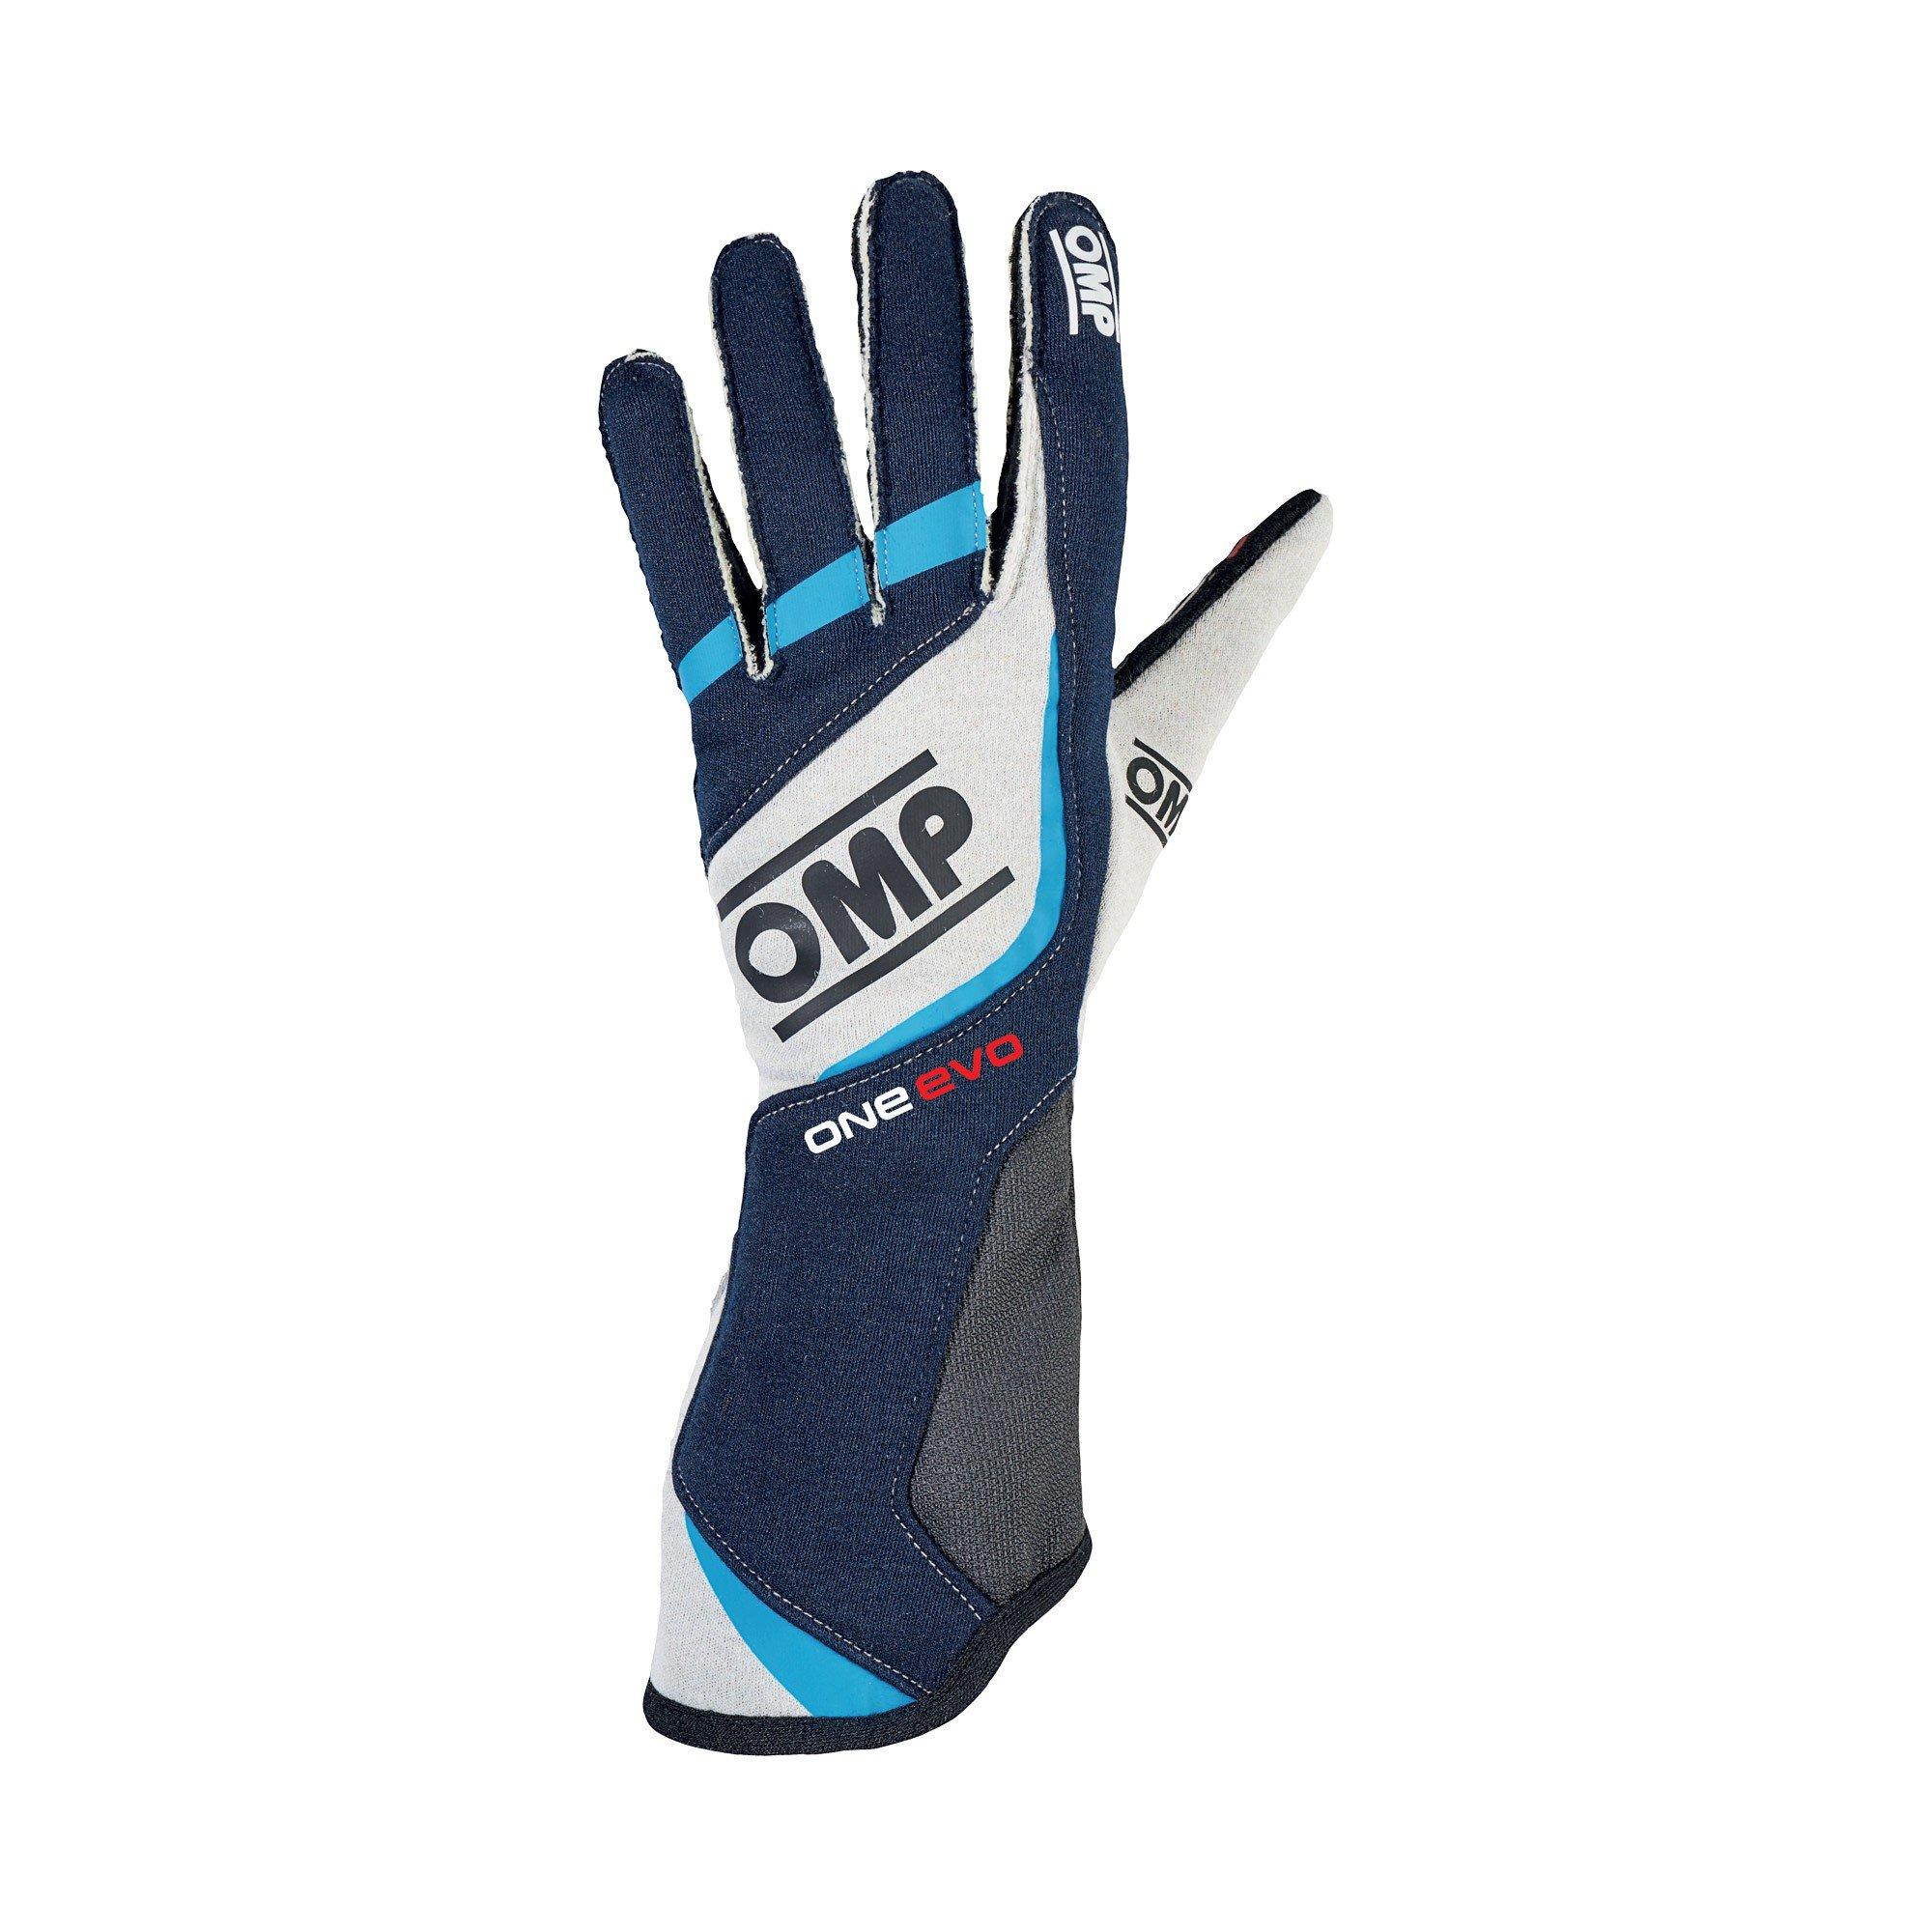 OMP Unisex-Adult ONE EVO GLOVES (Navy blue/white/cyan, XL)